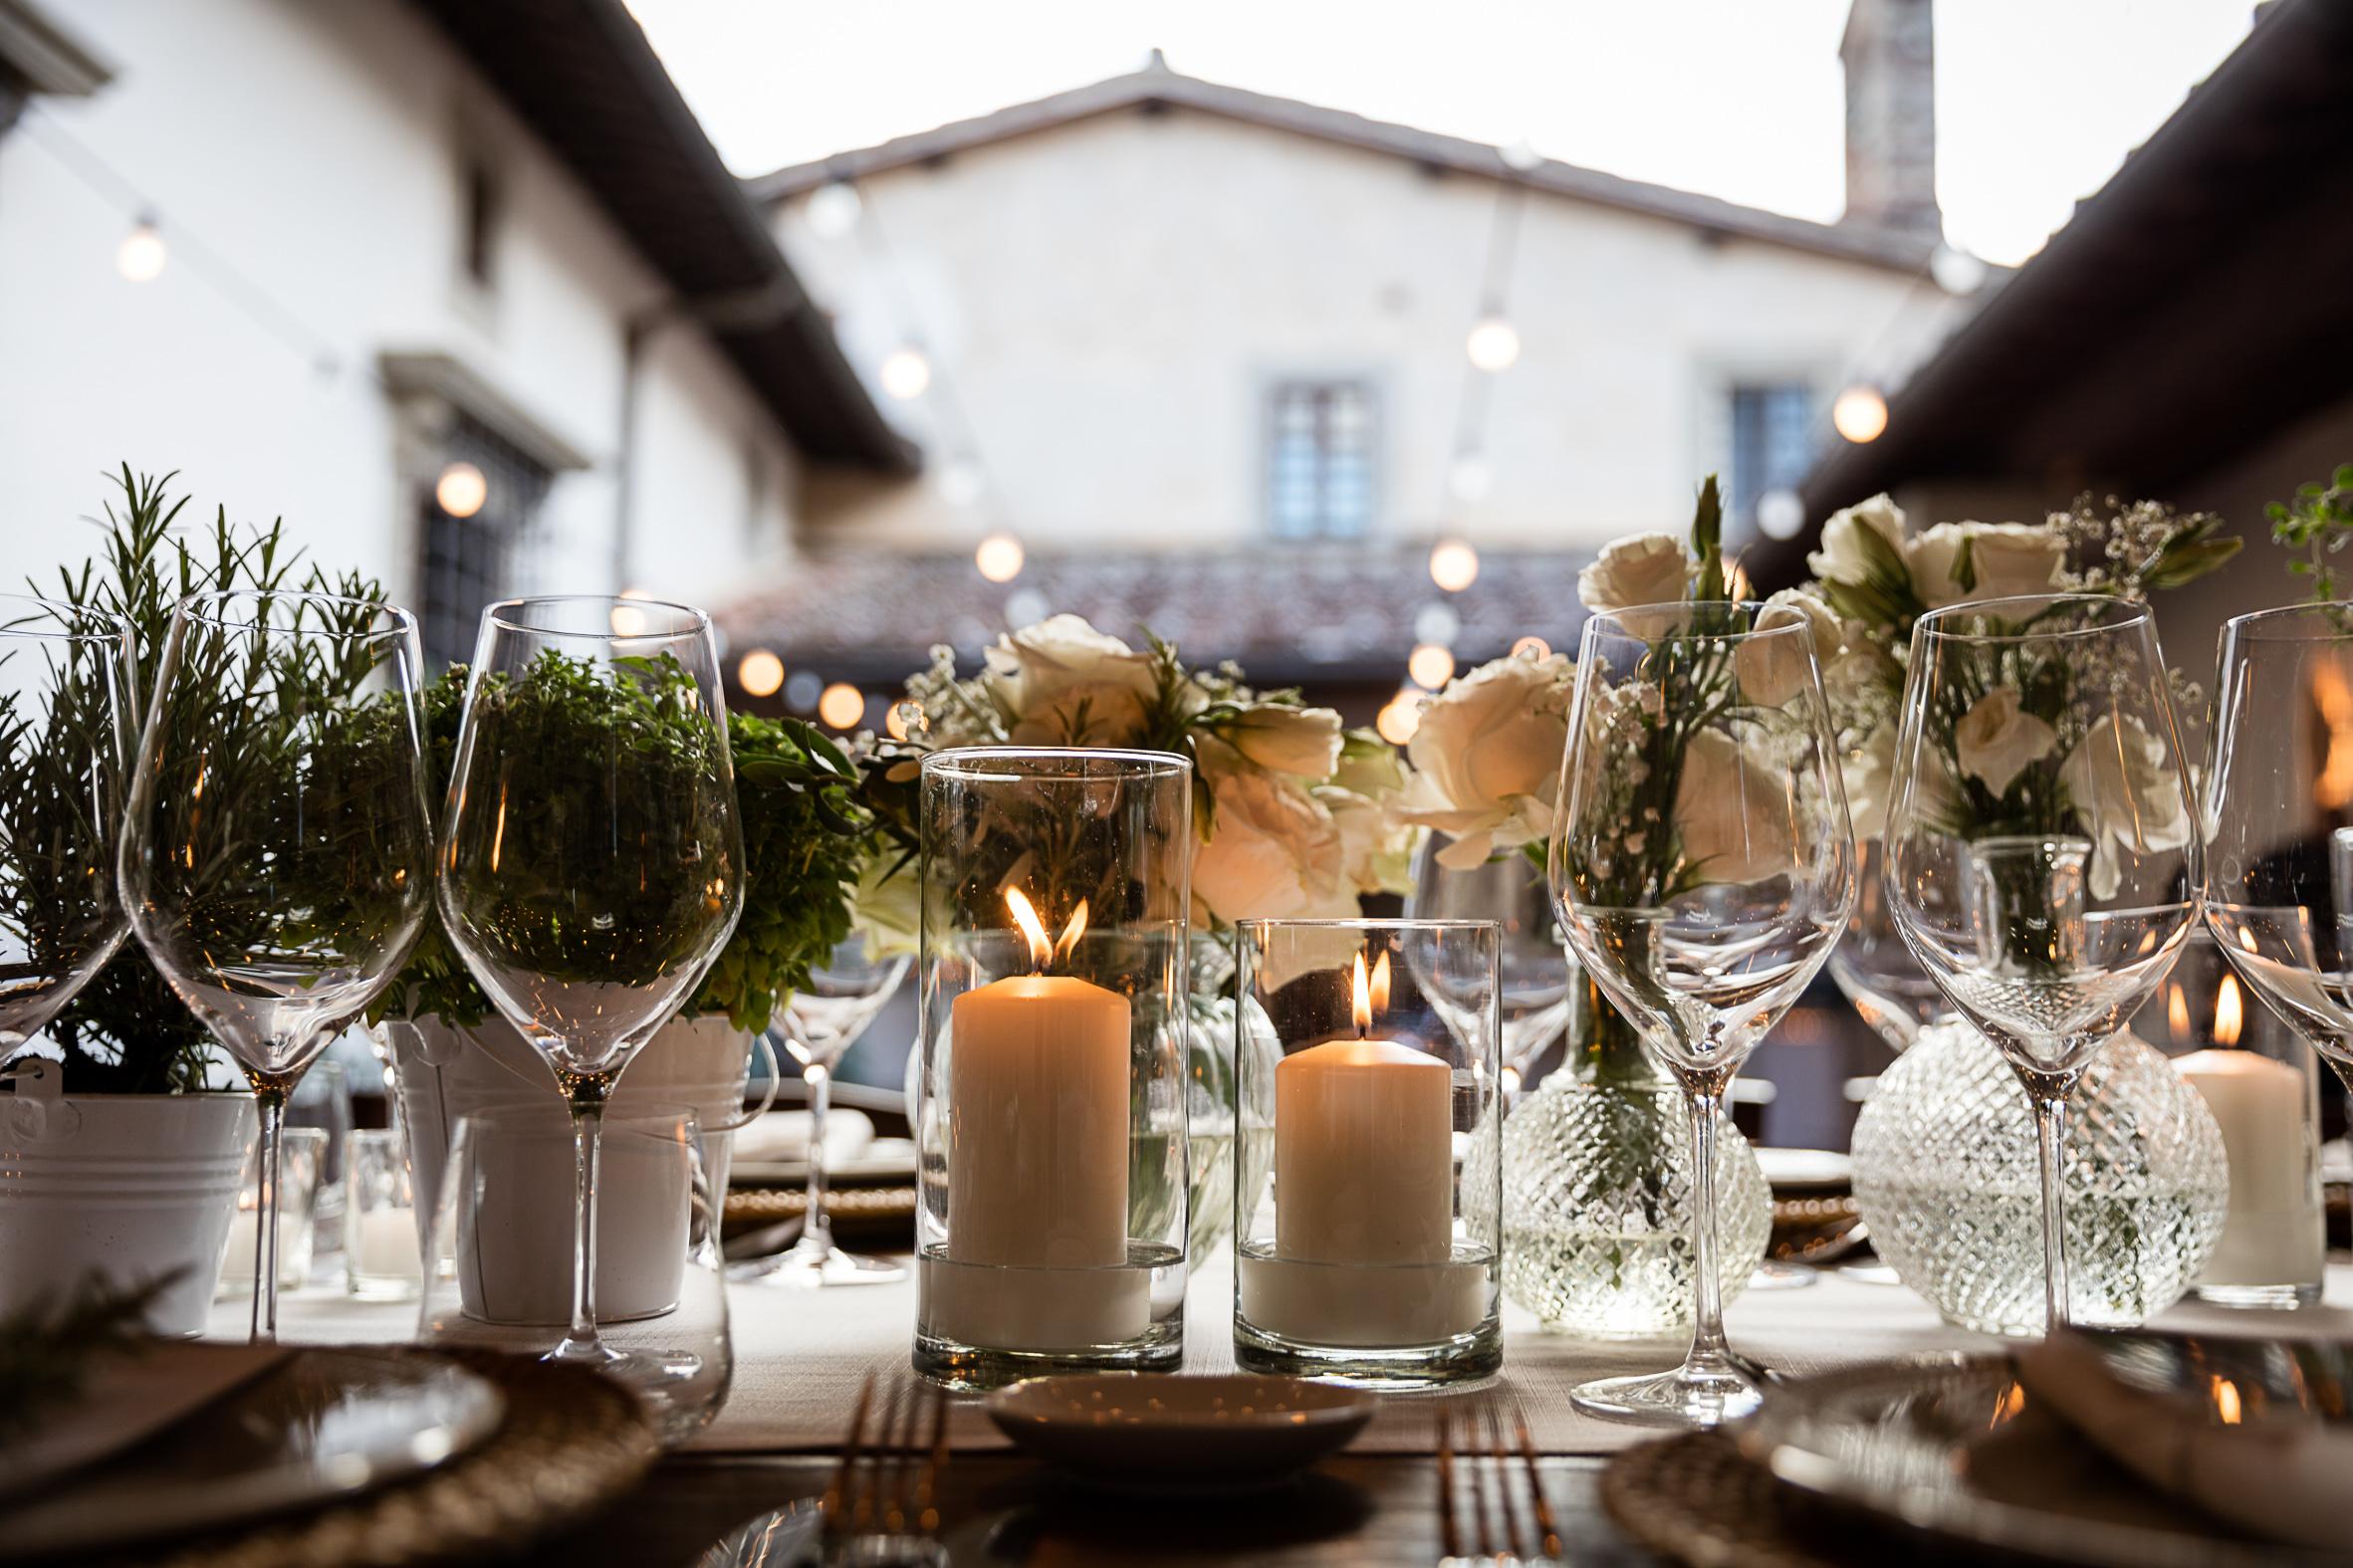 Hochzeit Andrea und Dario_Toskana 2017_215_a4.jpg